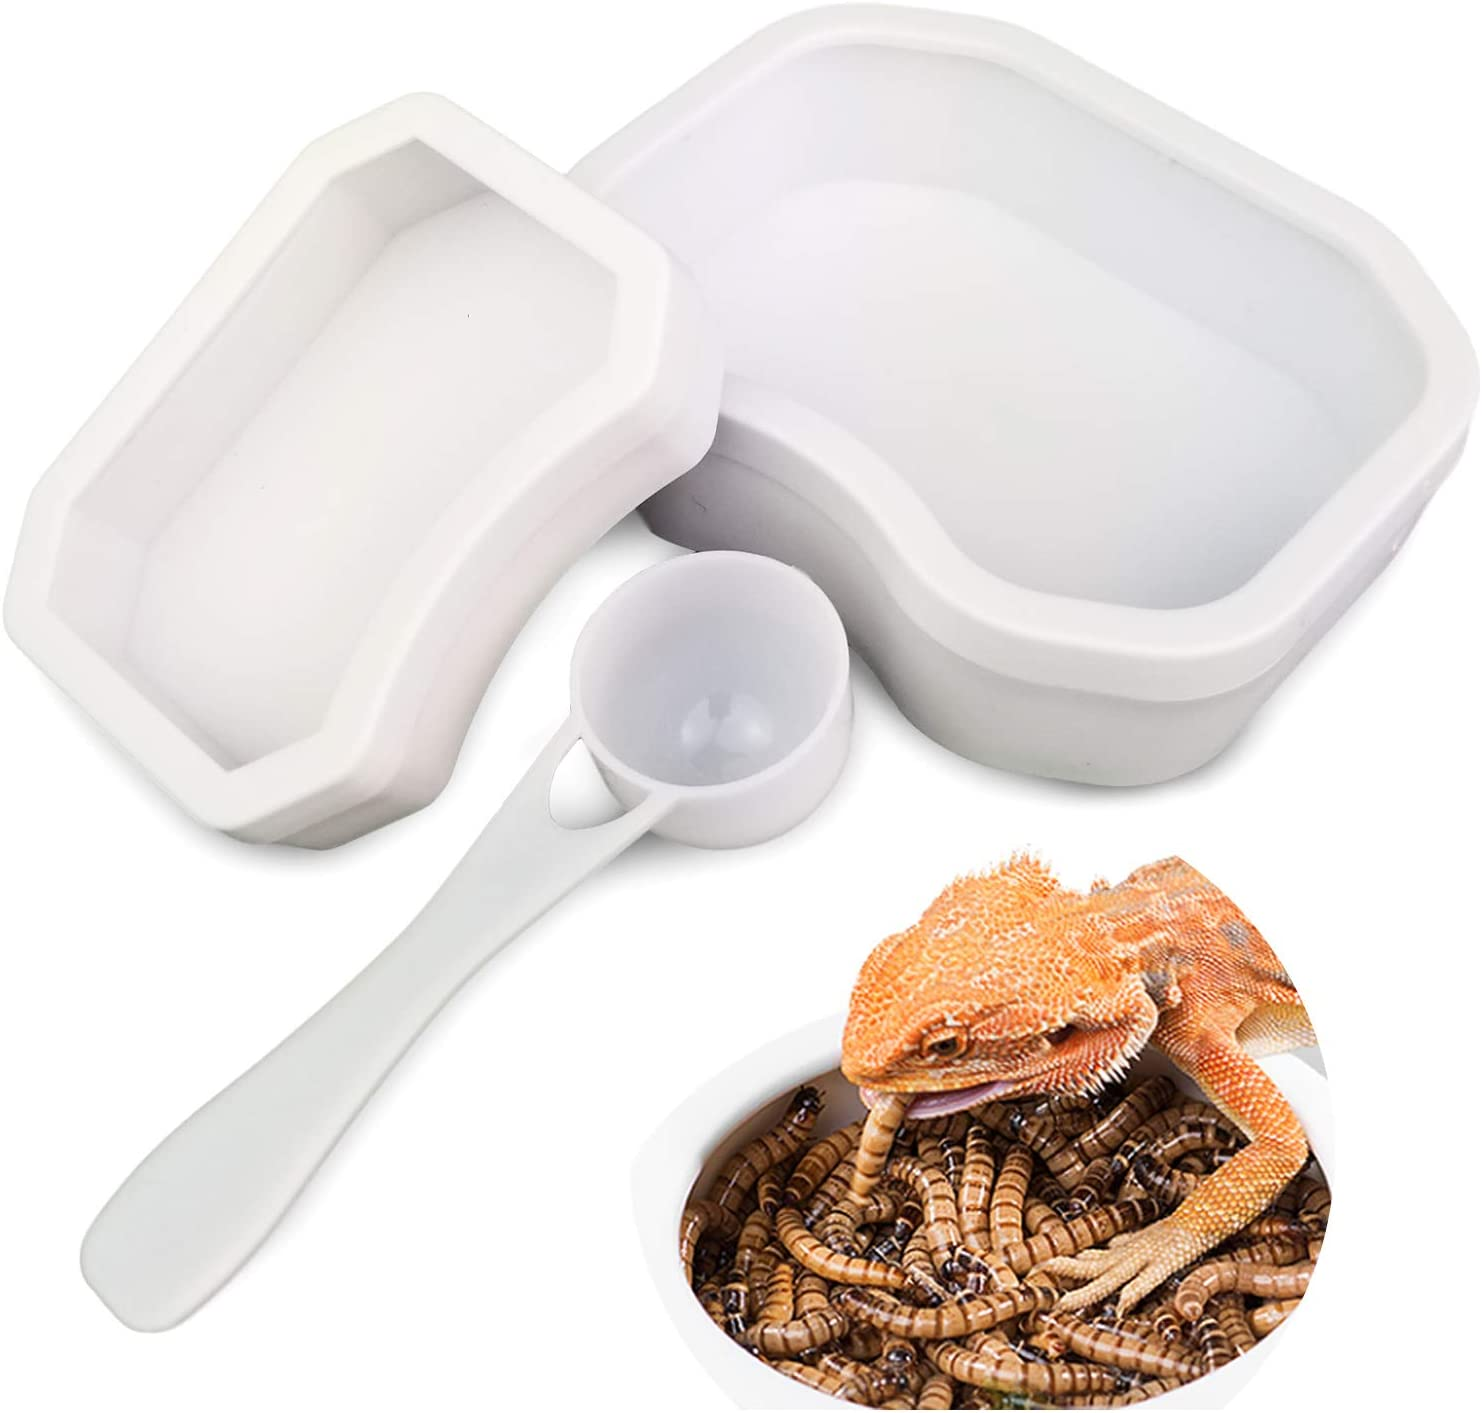 BINANO 3Pcs-Set Reptile Water Bowls Water Dish Worm Feeding Feeder for Lizard Turtle Bearded Dragon Leopard Gecko Plastic Feeding Bowl(White)